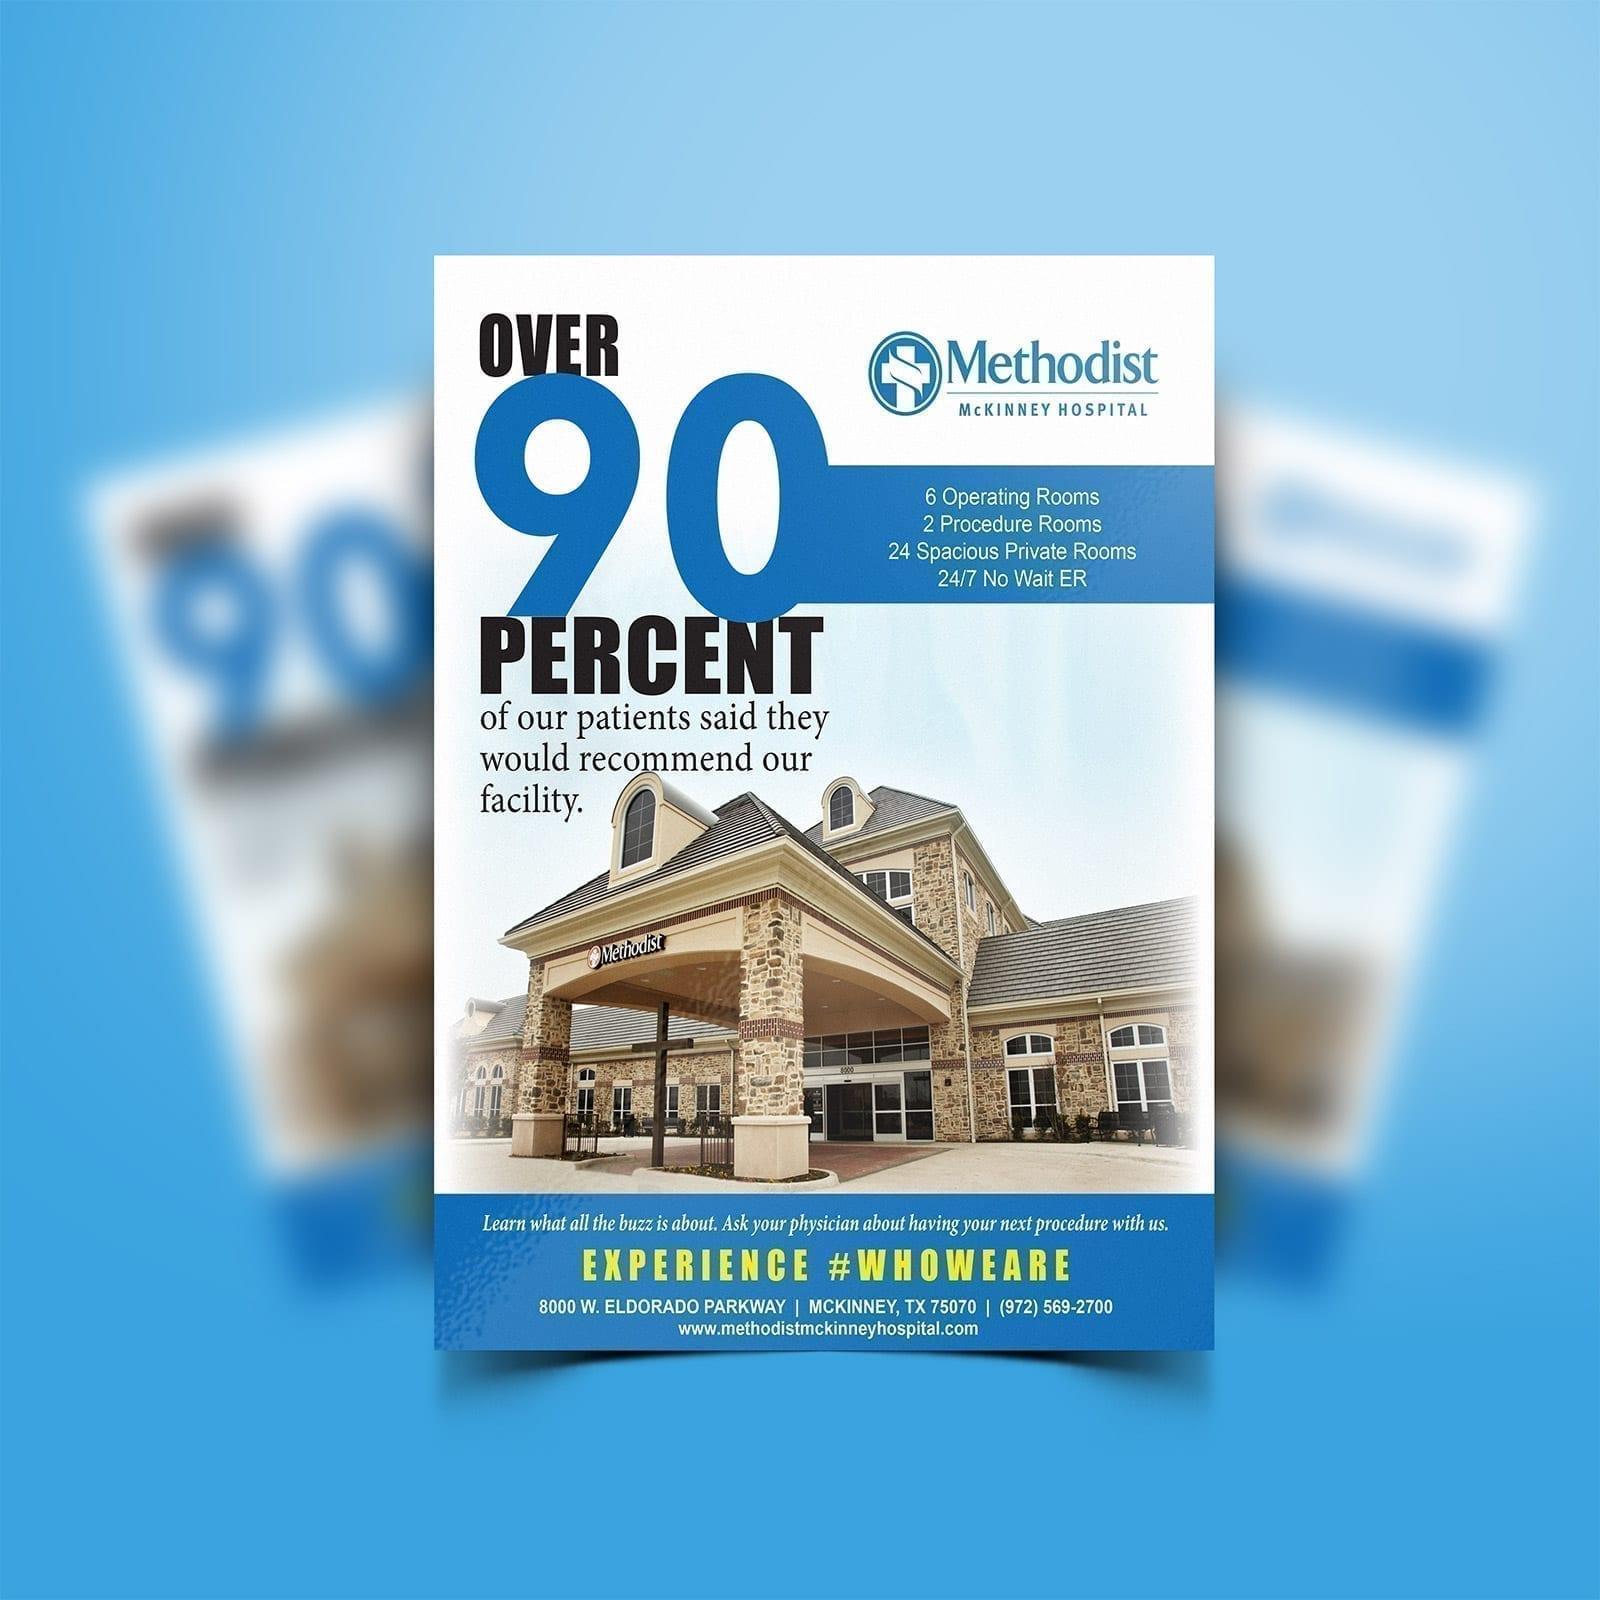 Methodist McKinney Hospital & Companies | Brand Activation